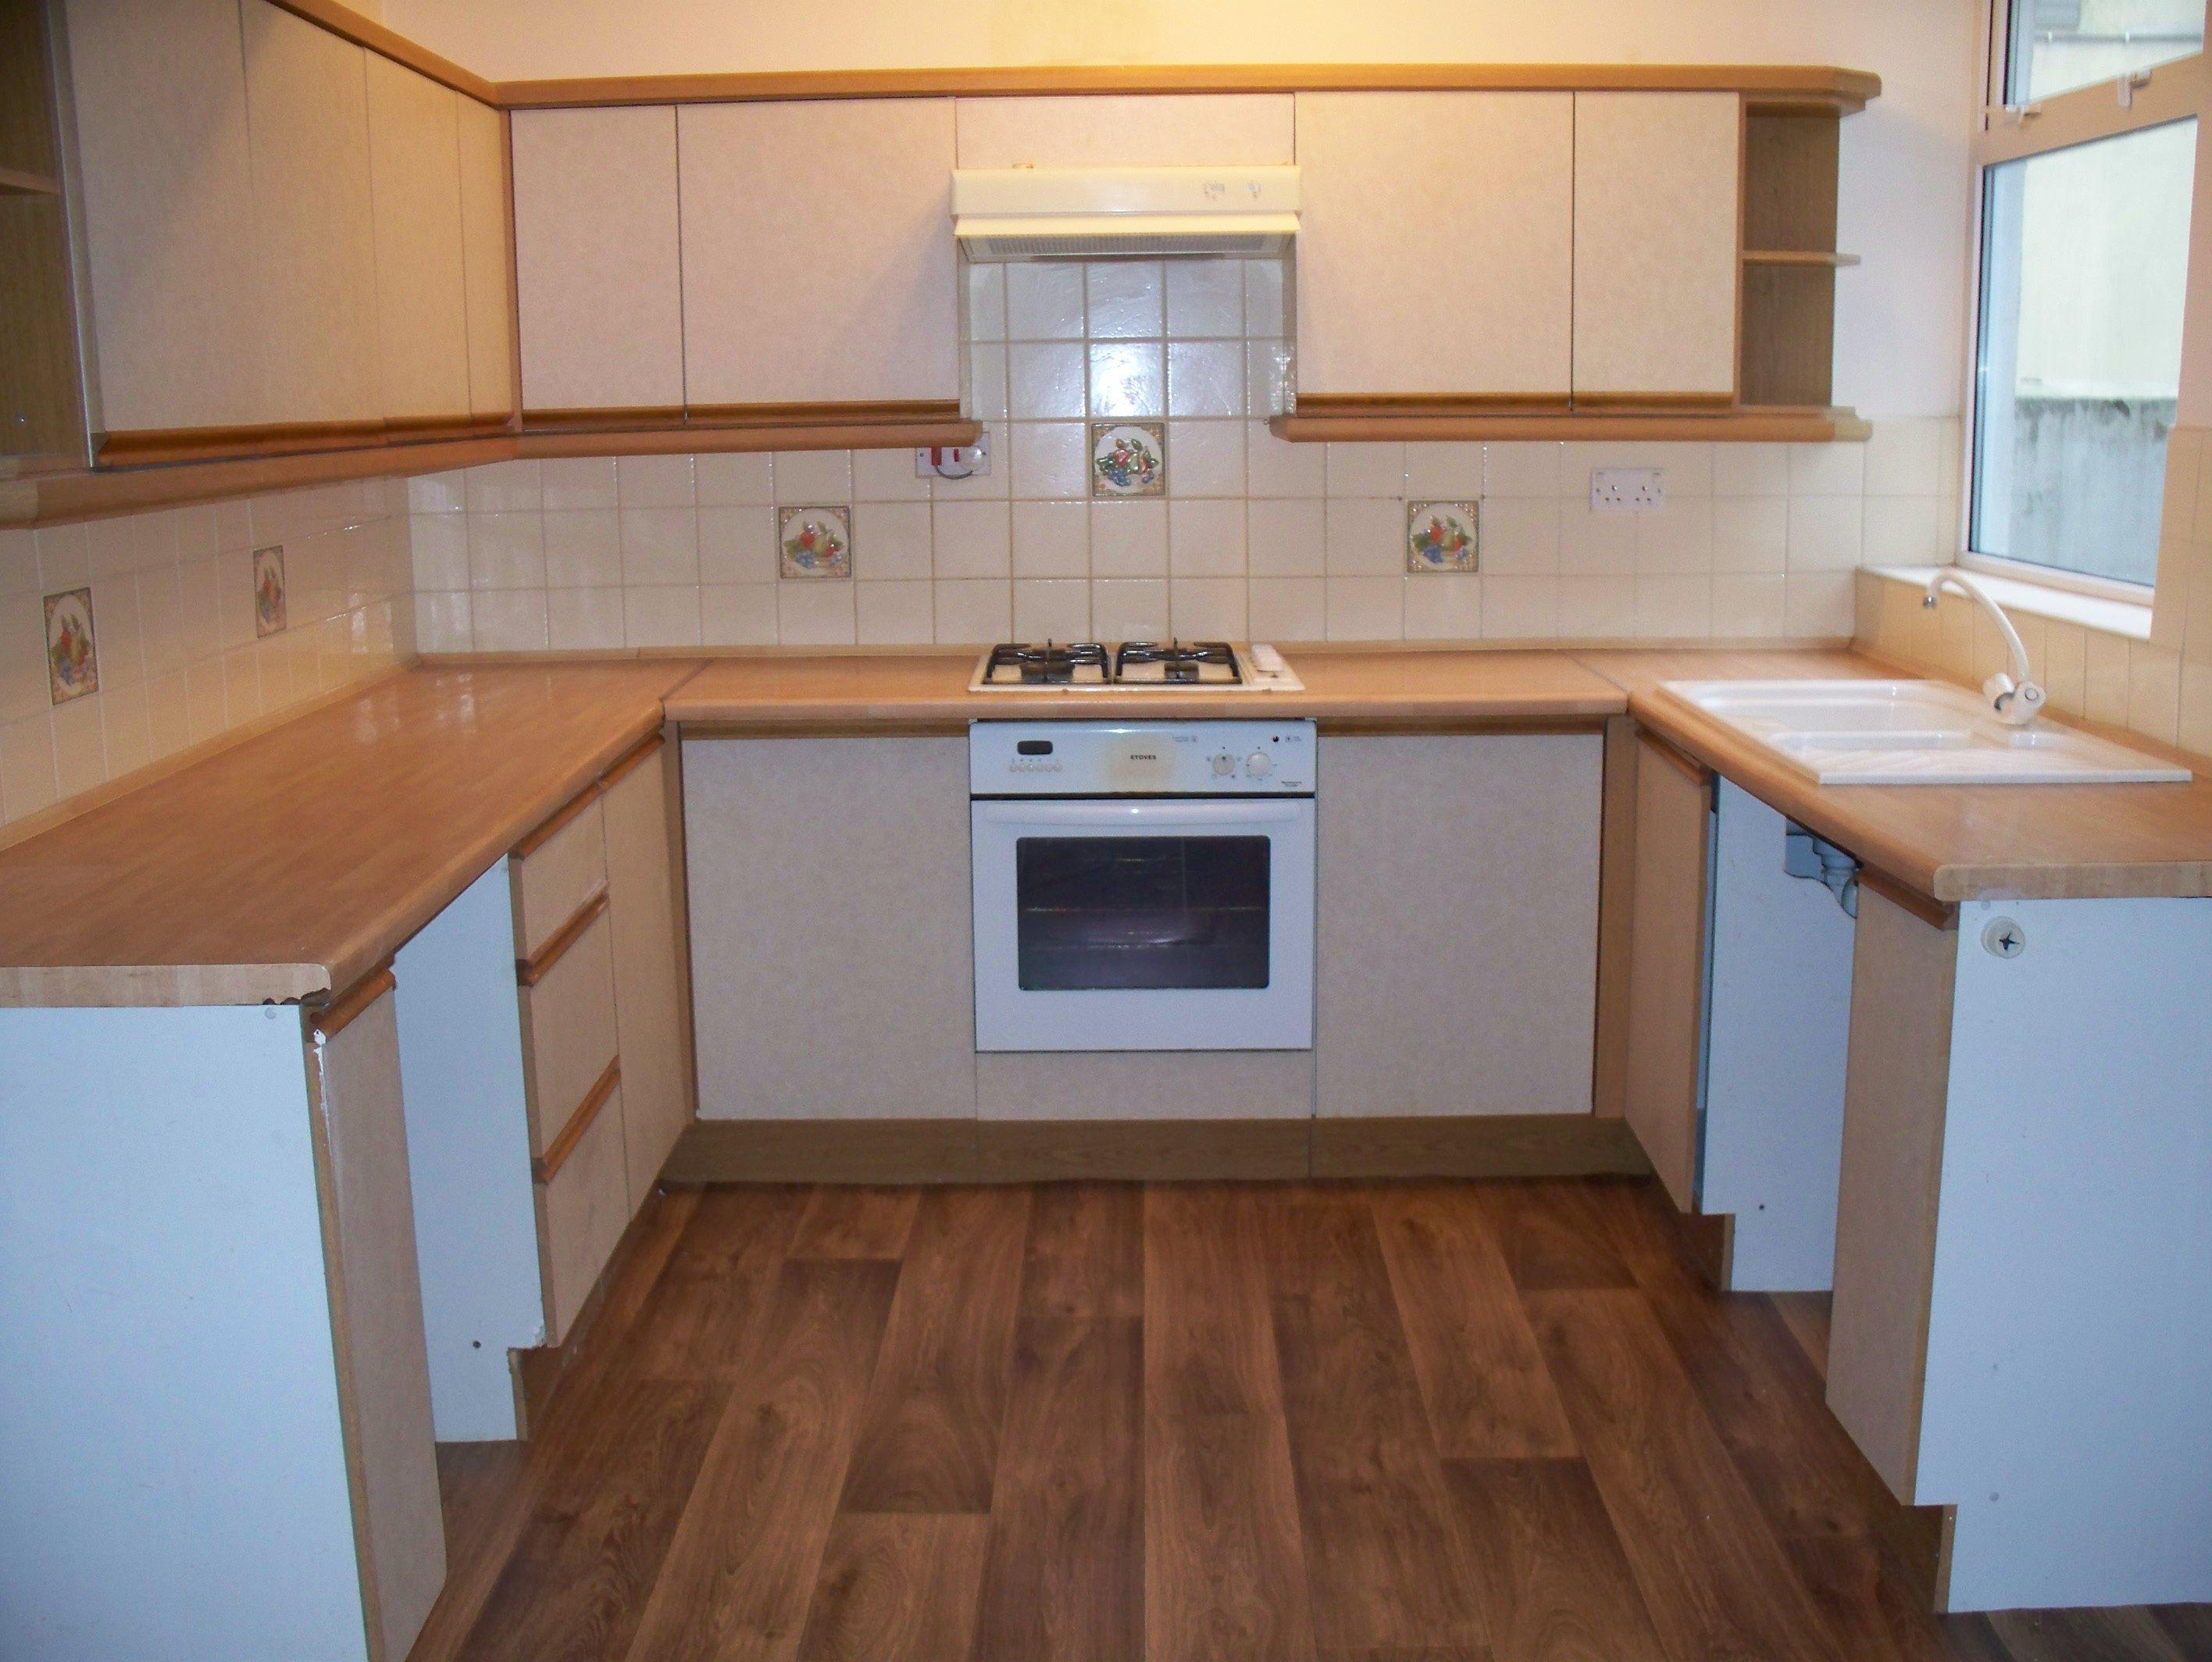 Wisemove. Property for sale. King Edward Street, Blaengarw.  Kitchen